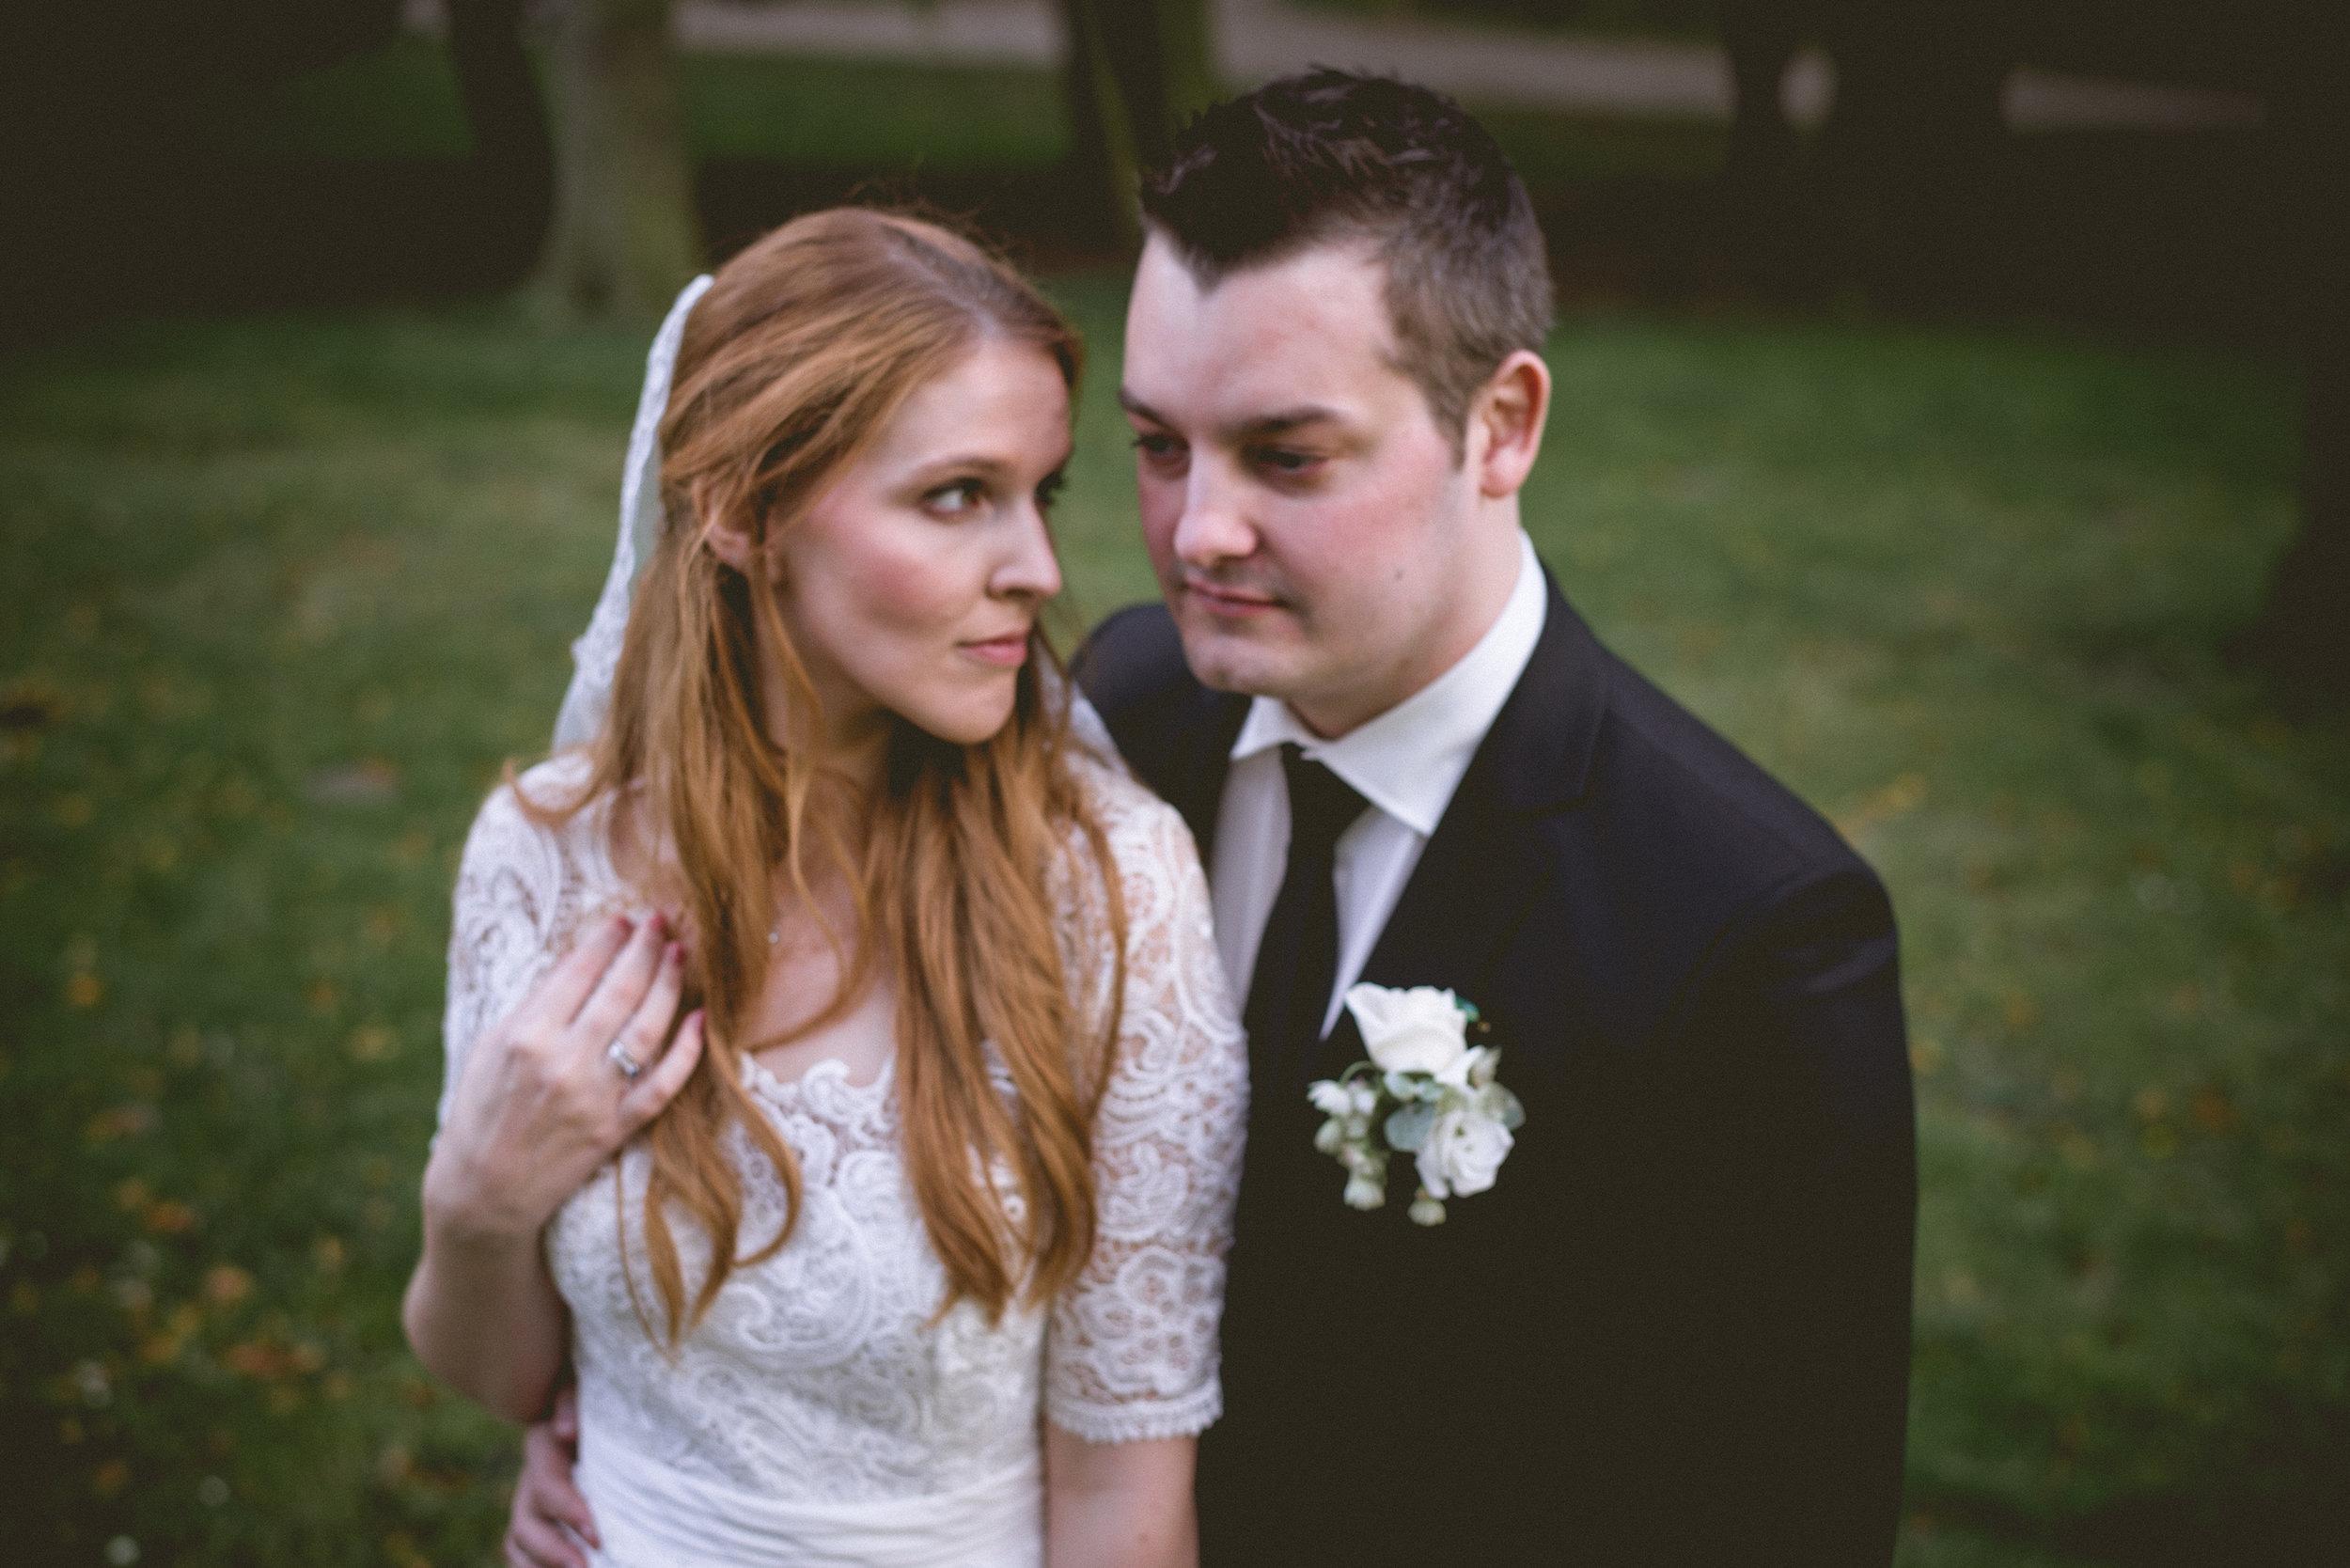 York Region Ontario Wedding Photographer - Bride + Groom-57.jpg